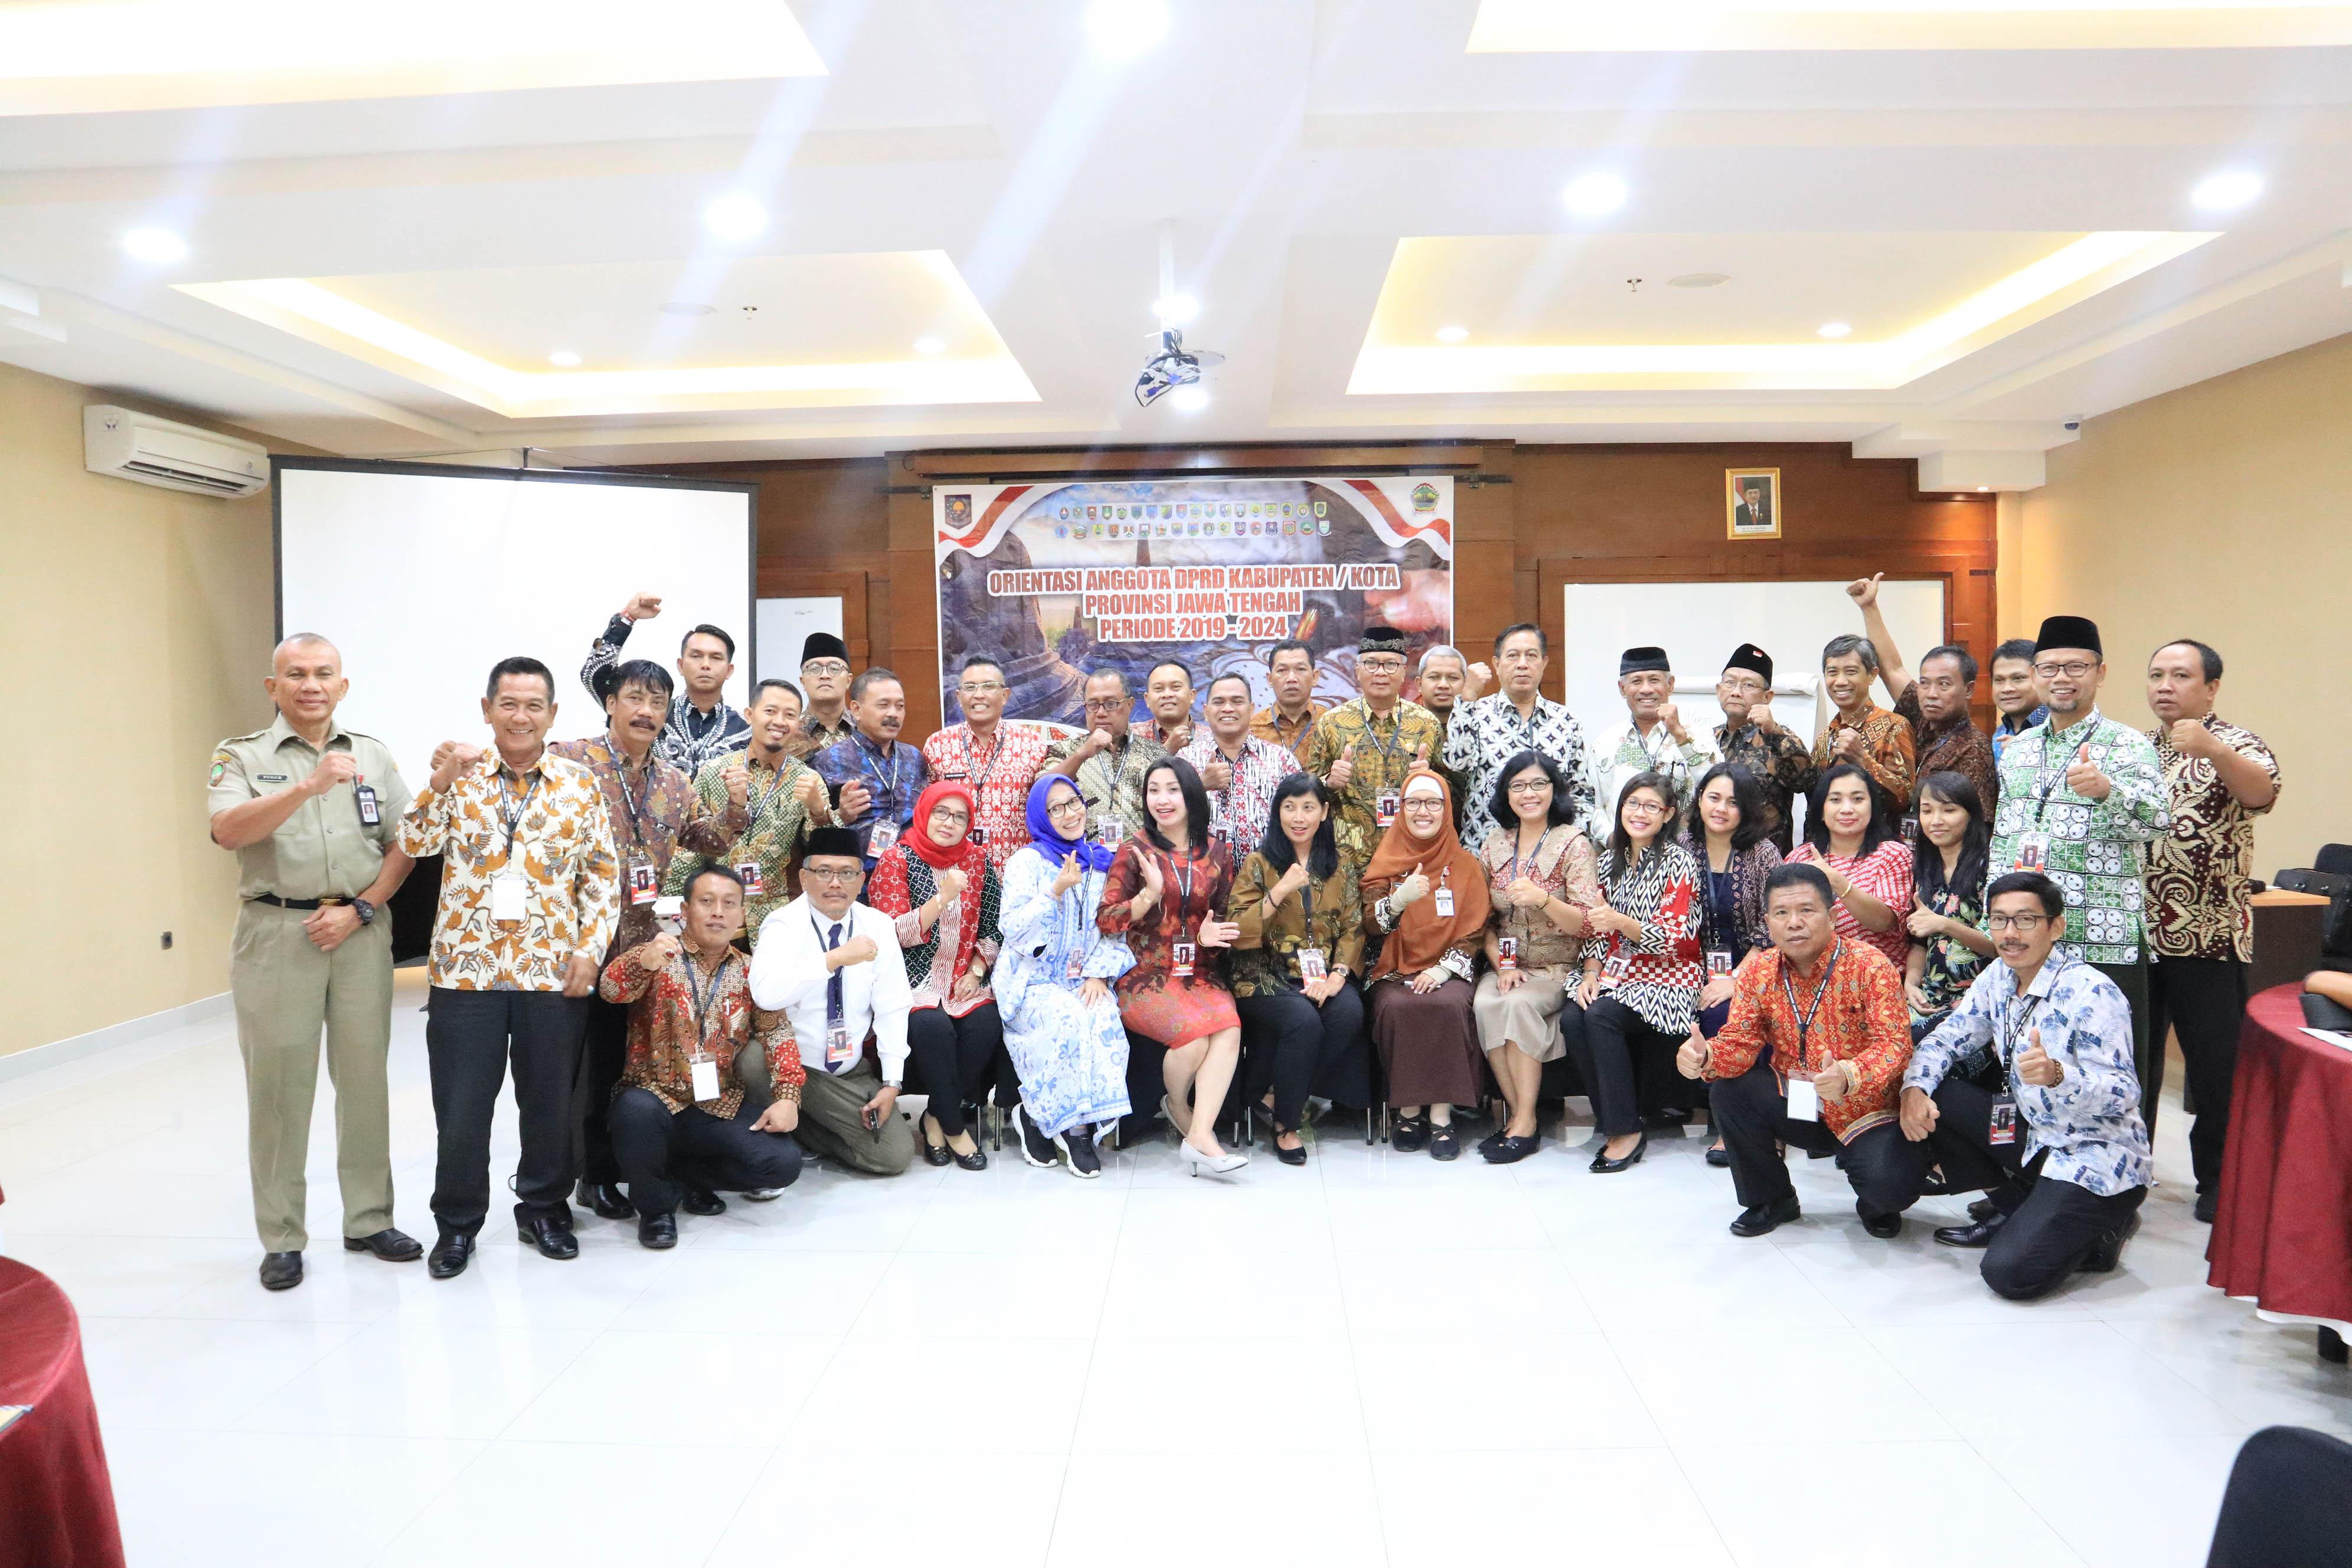 Kegiatan Orientasi Anggota DPRD Kota Surakarta